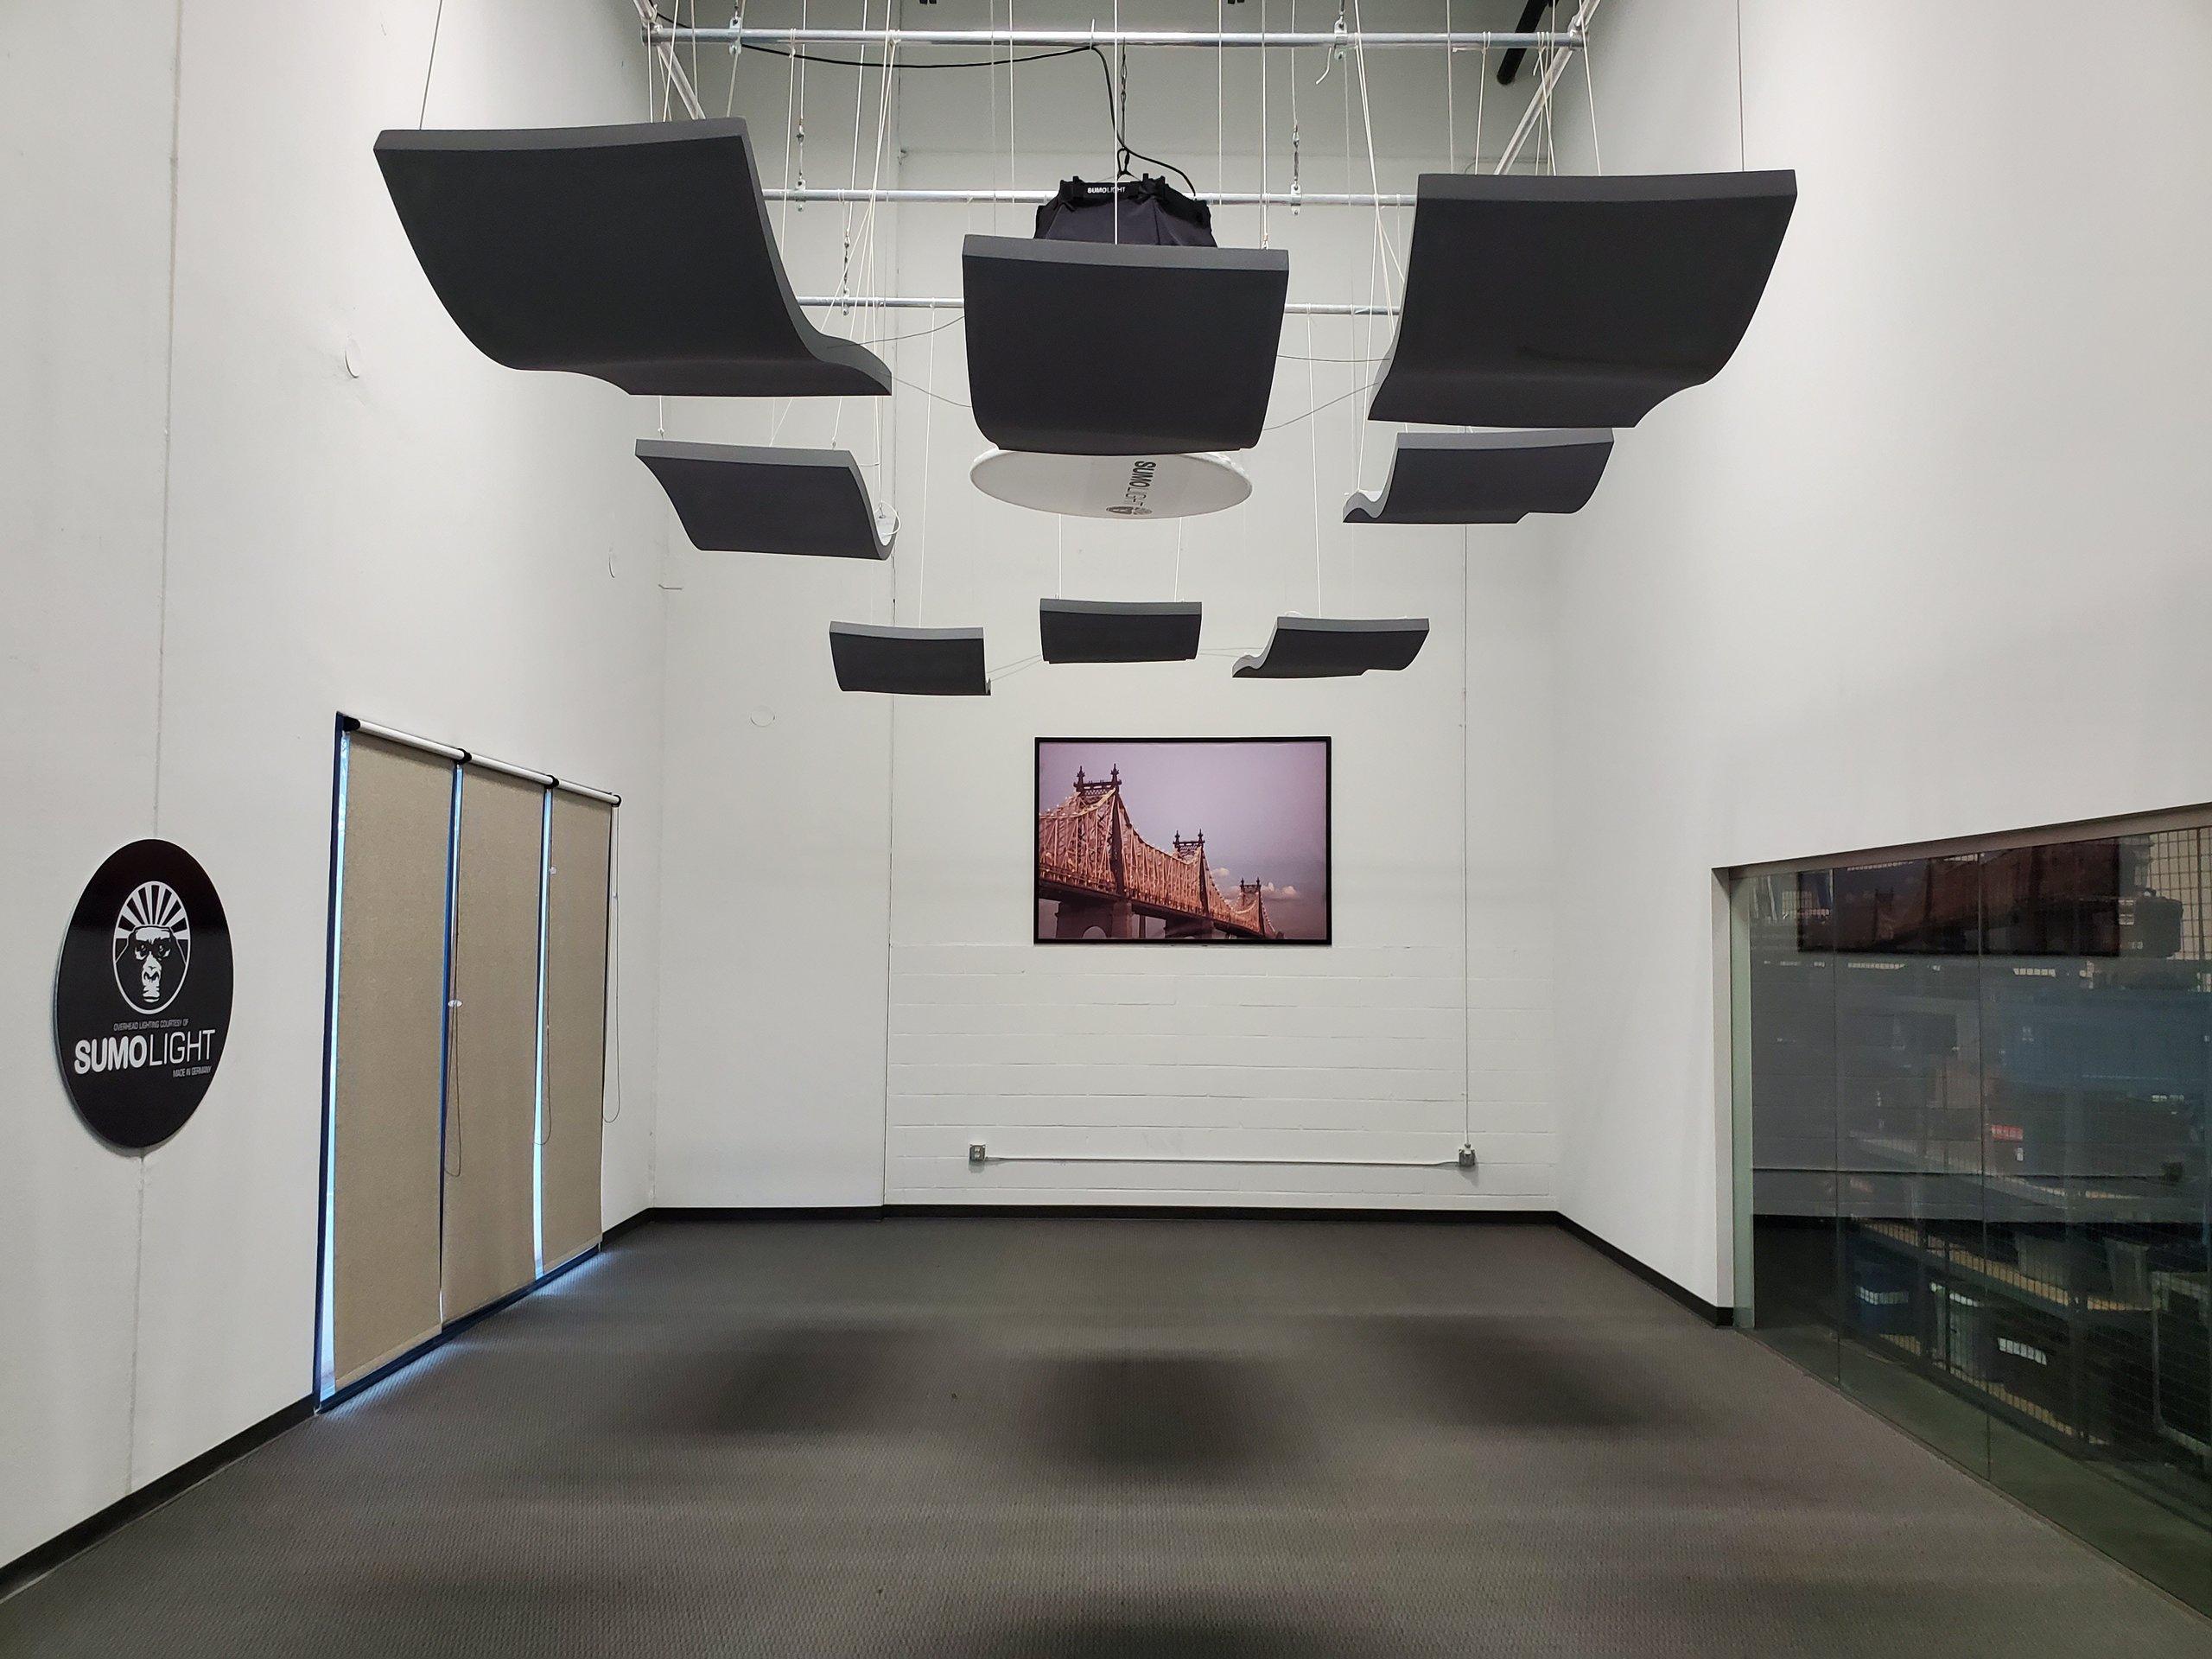 31x17 Warehouse self storage unit